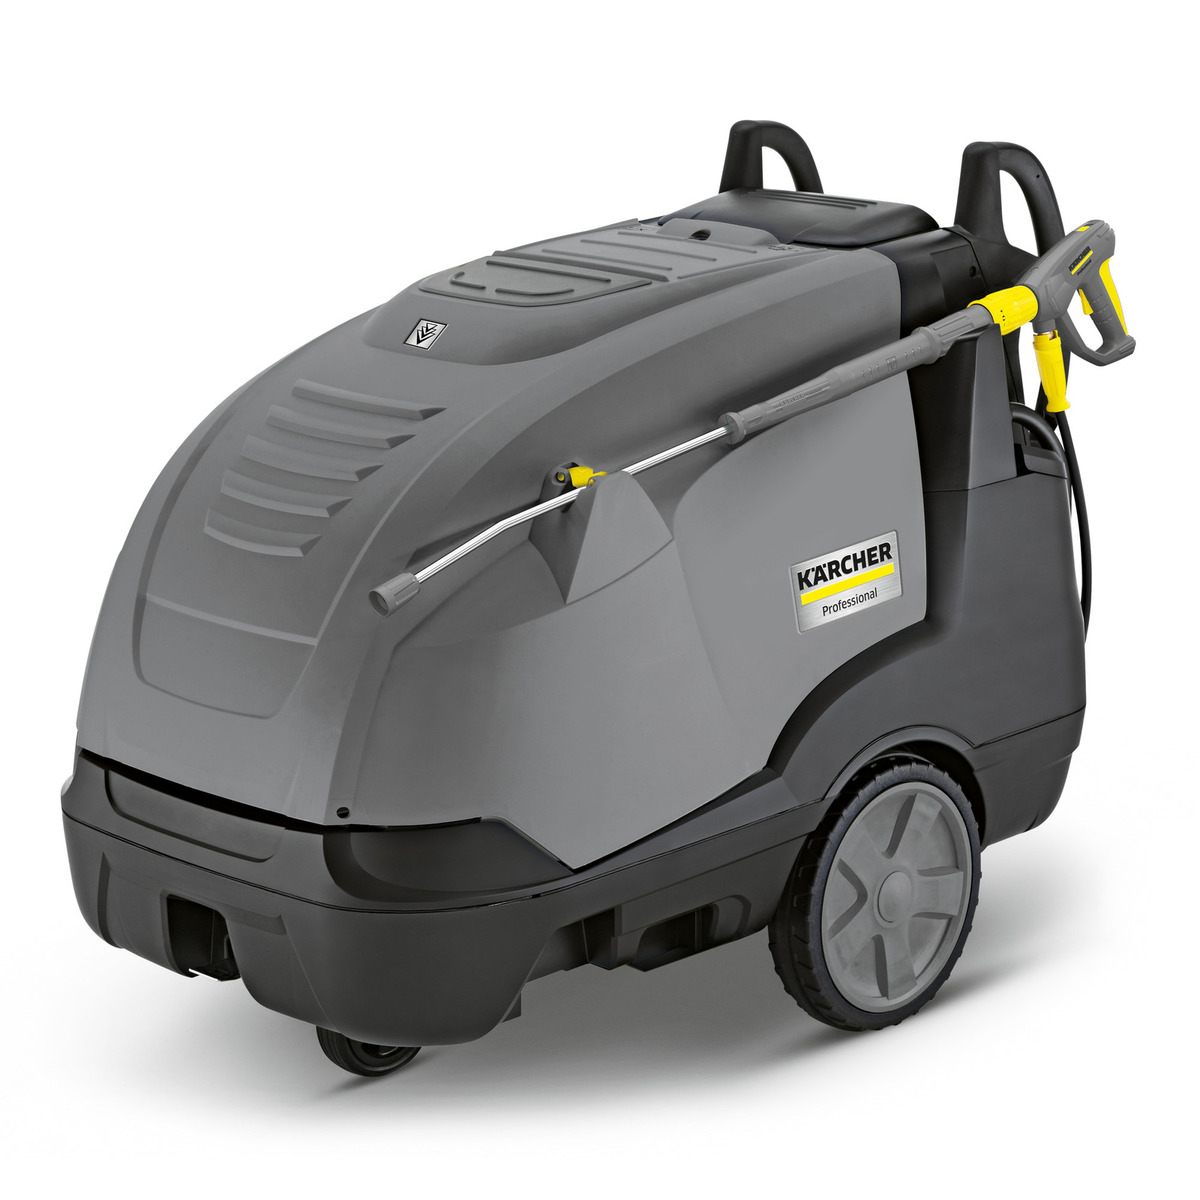 HDS-E 8/16-4 M 24 kW热水高压清洗机